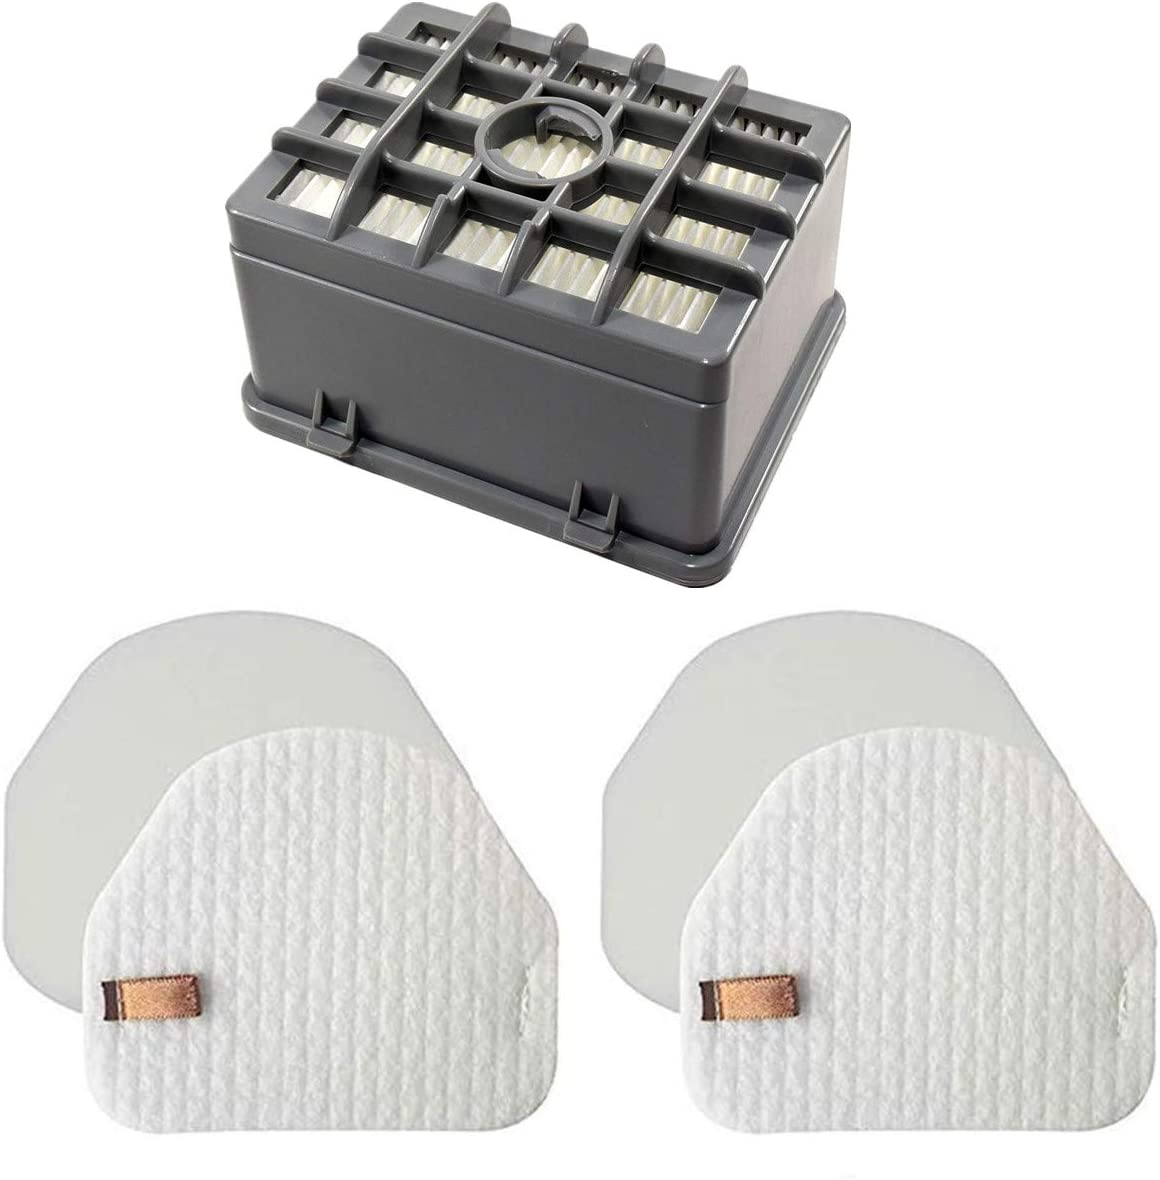 "LLHome NV200 Hepa Filter(1 Hepa+2 Foam&Felt for Shark NV450 NV480 NV472 NV481 NV201 NV202 NV200 NV200Q NV200C NV202C Vacuum, XHF480 & XHF450 (Tall Size 2.75"")"